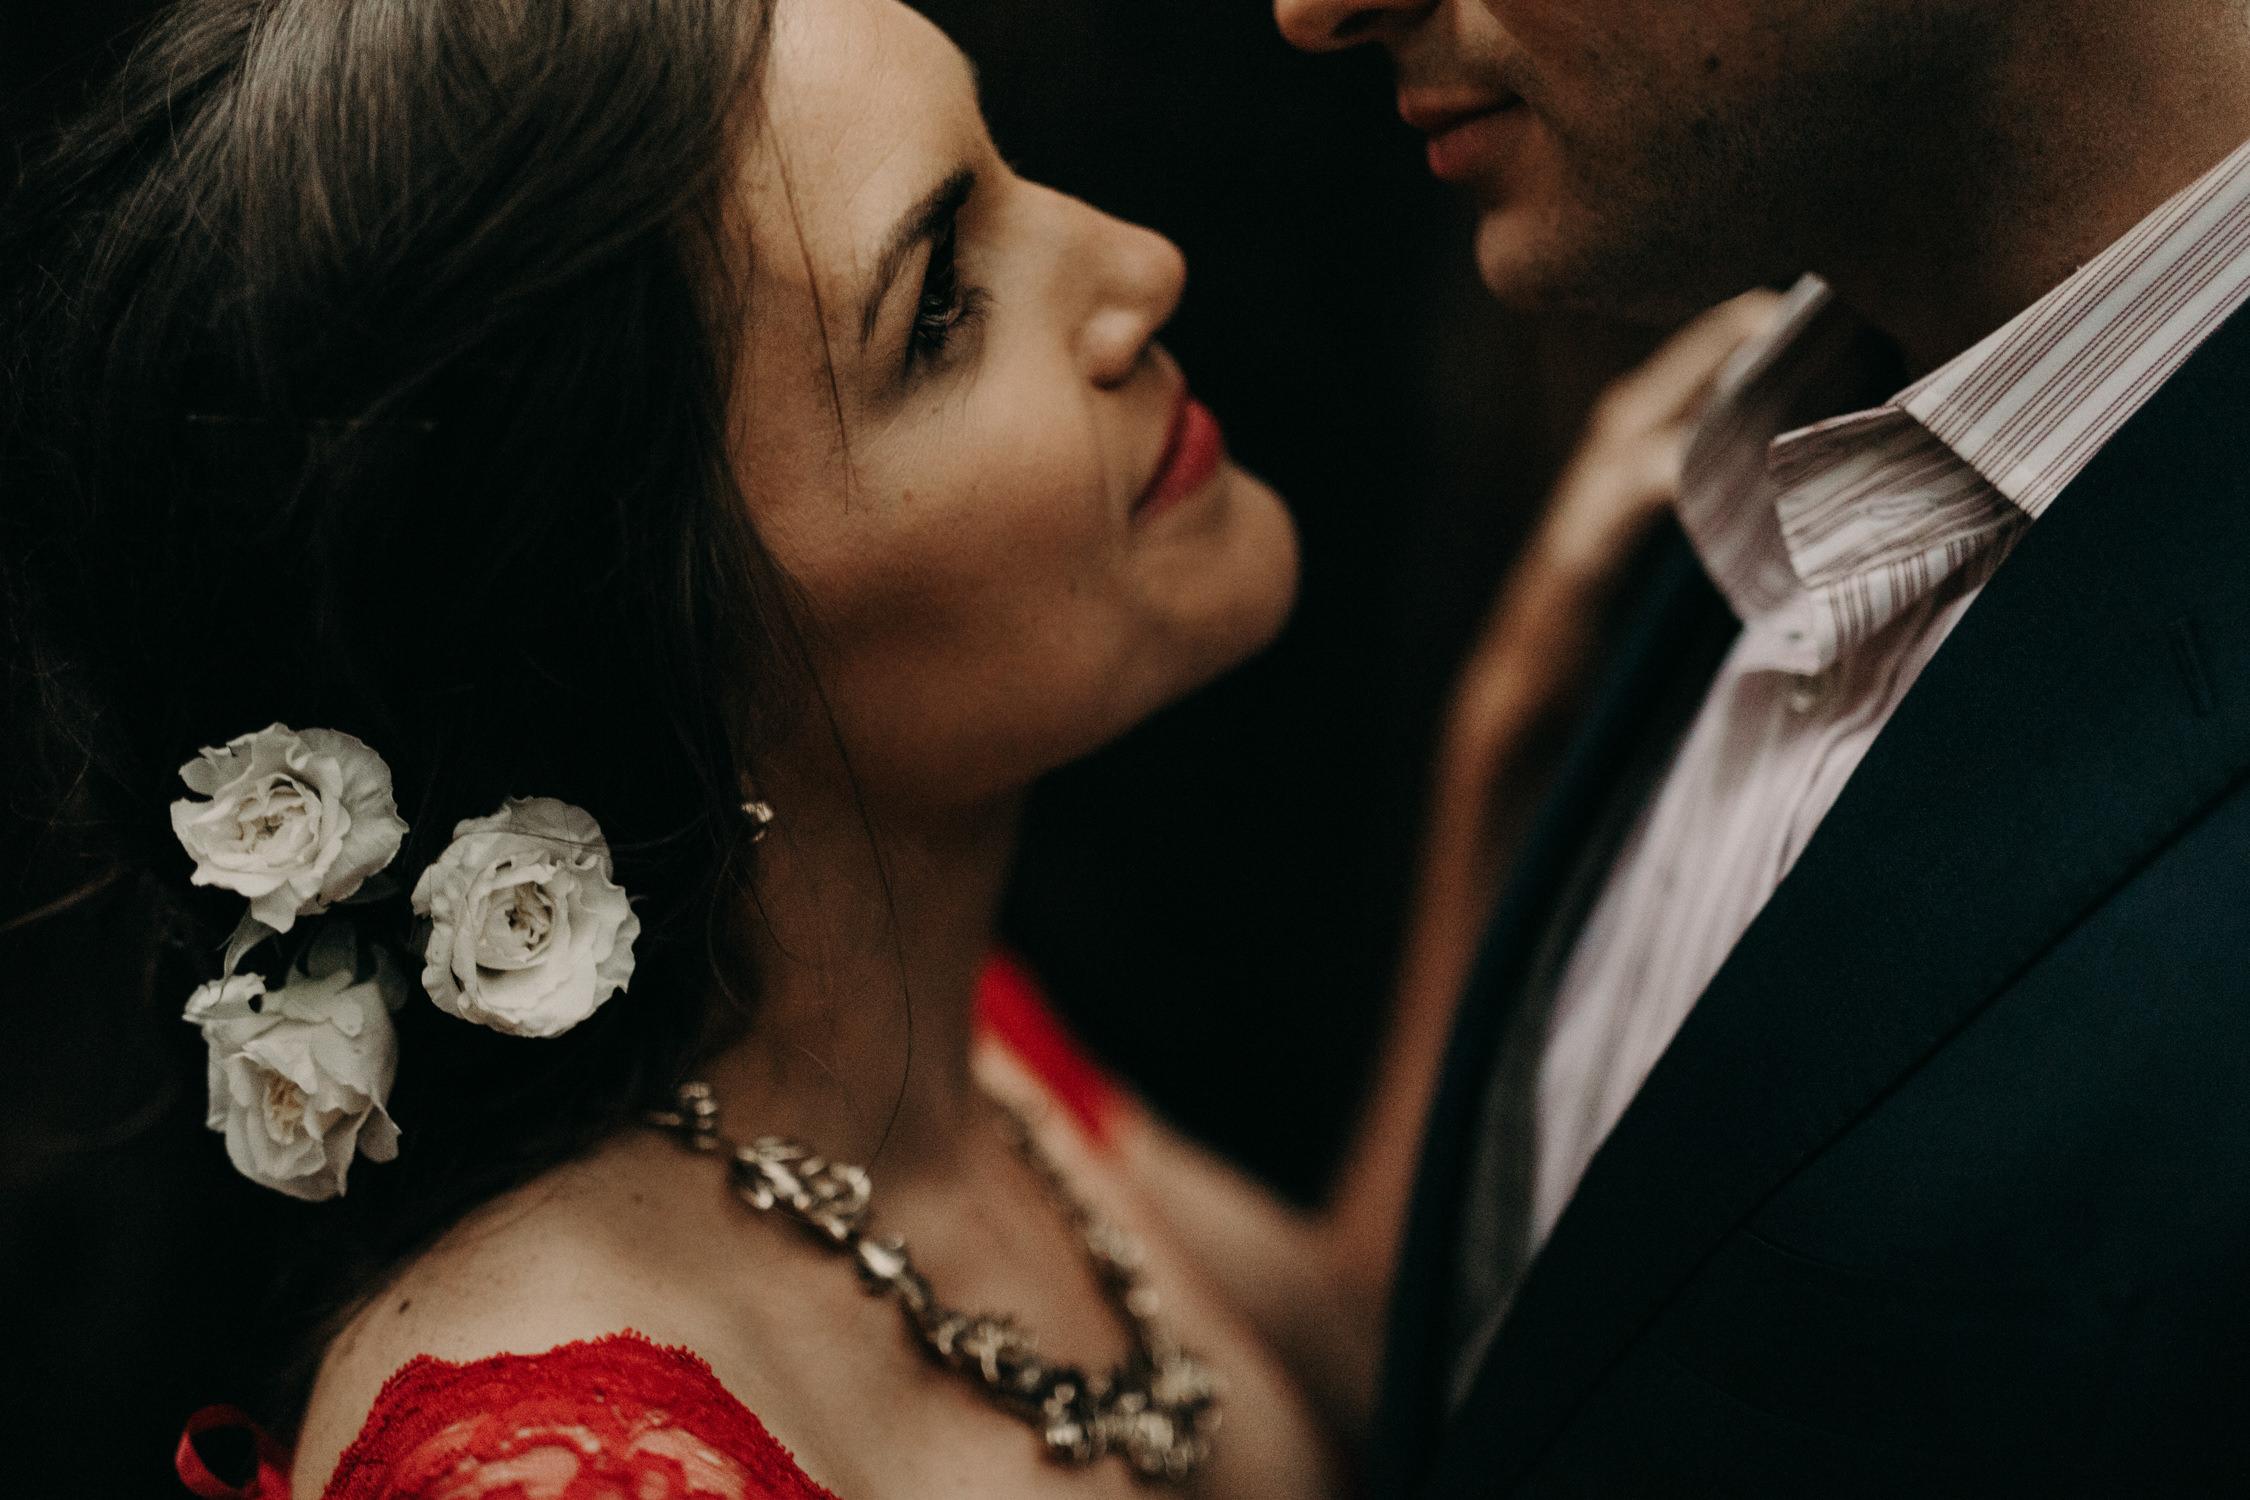 couple-intimate-engagement-session-mt-tam-48.jpg